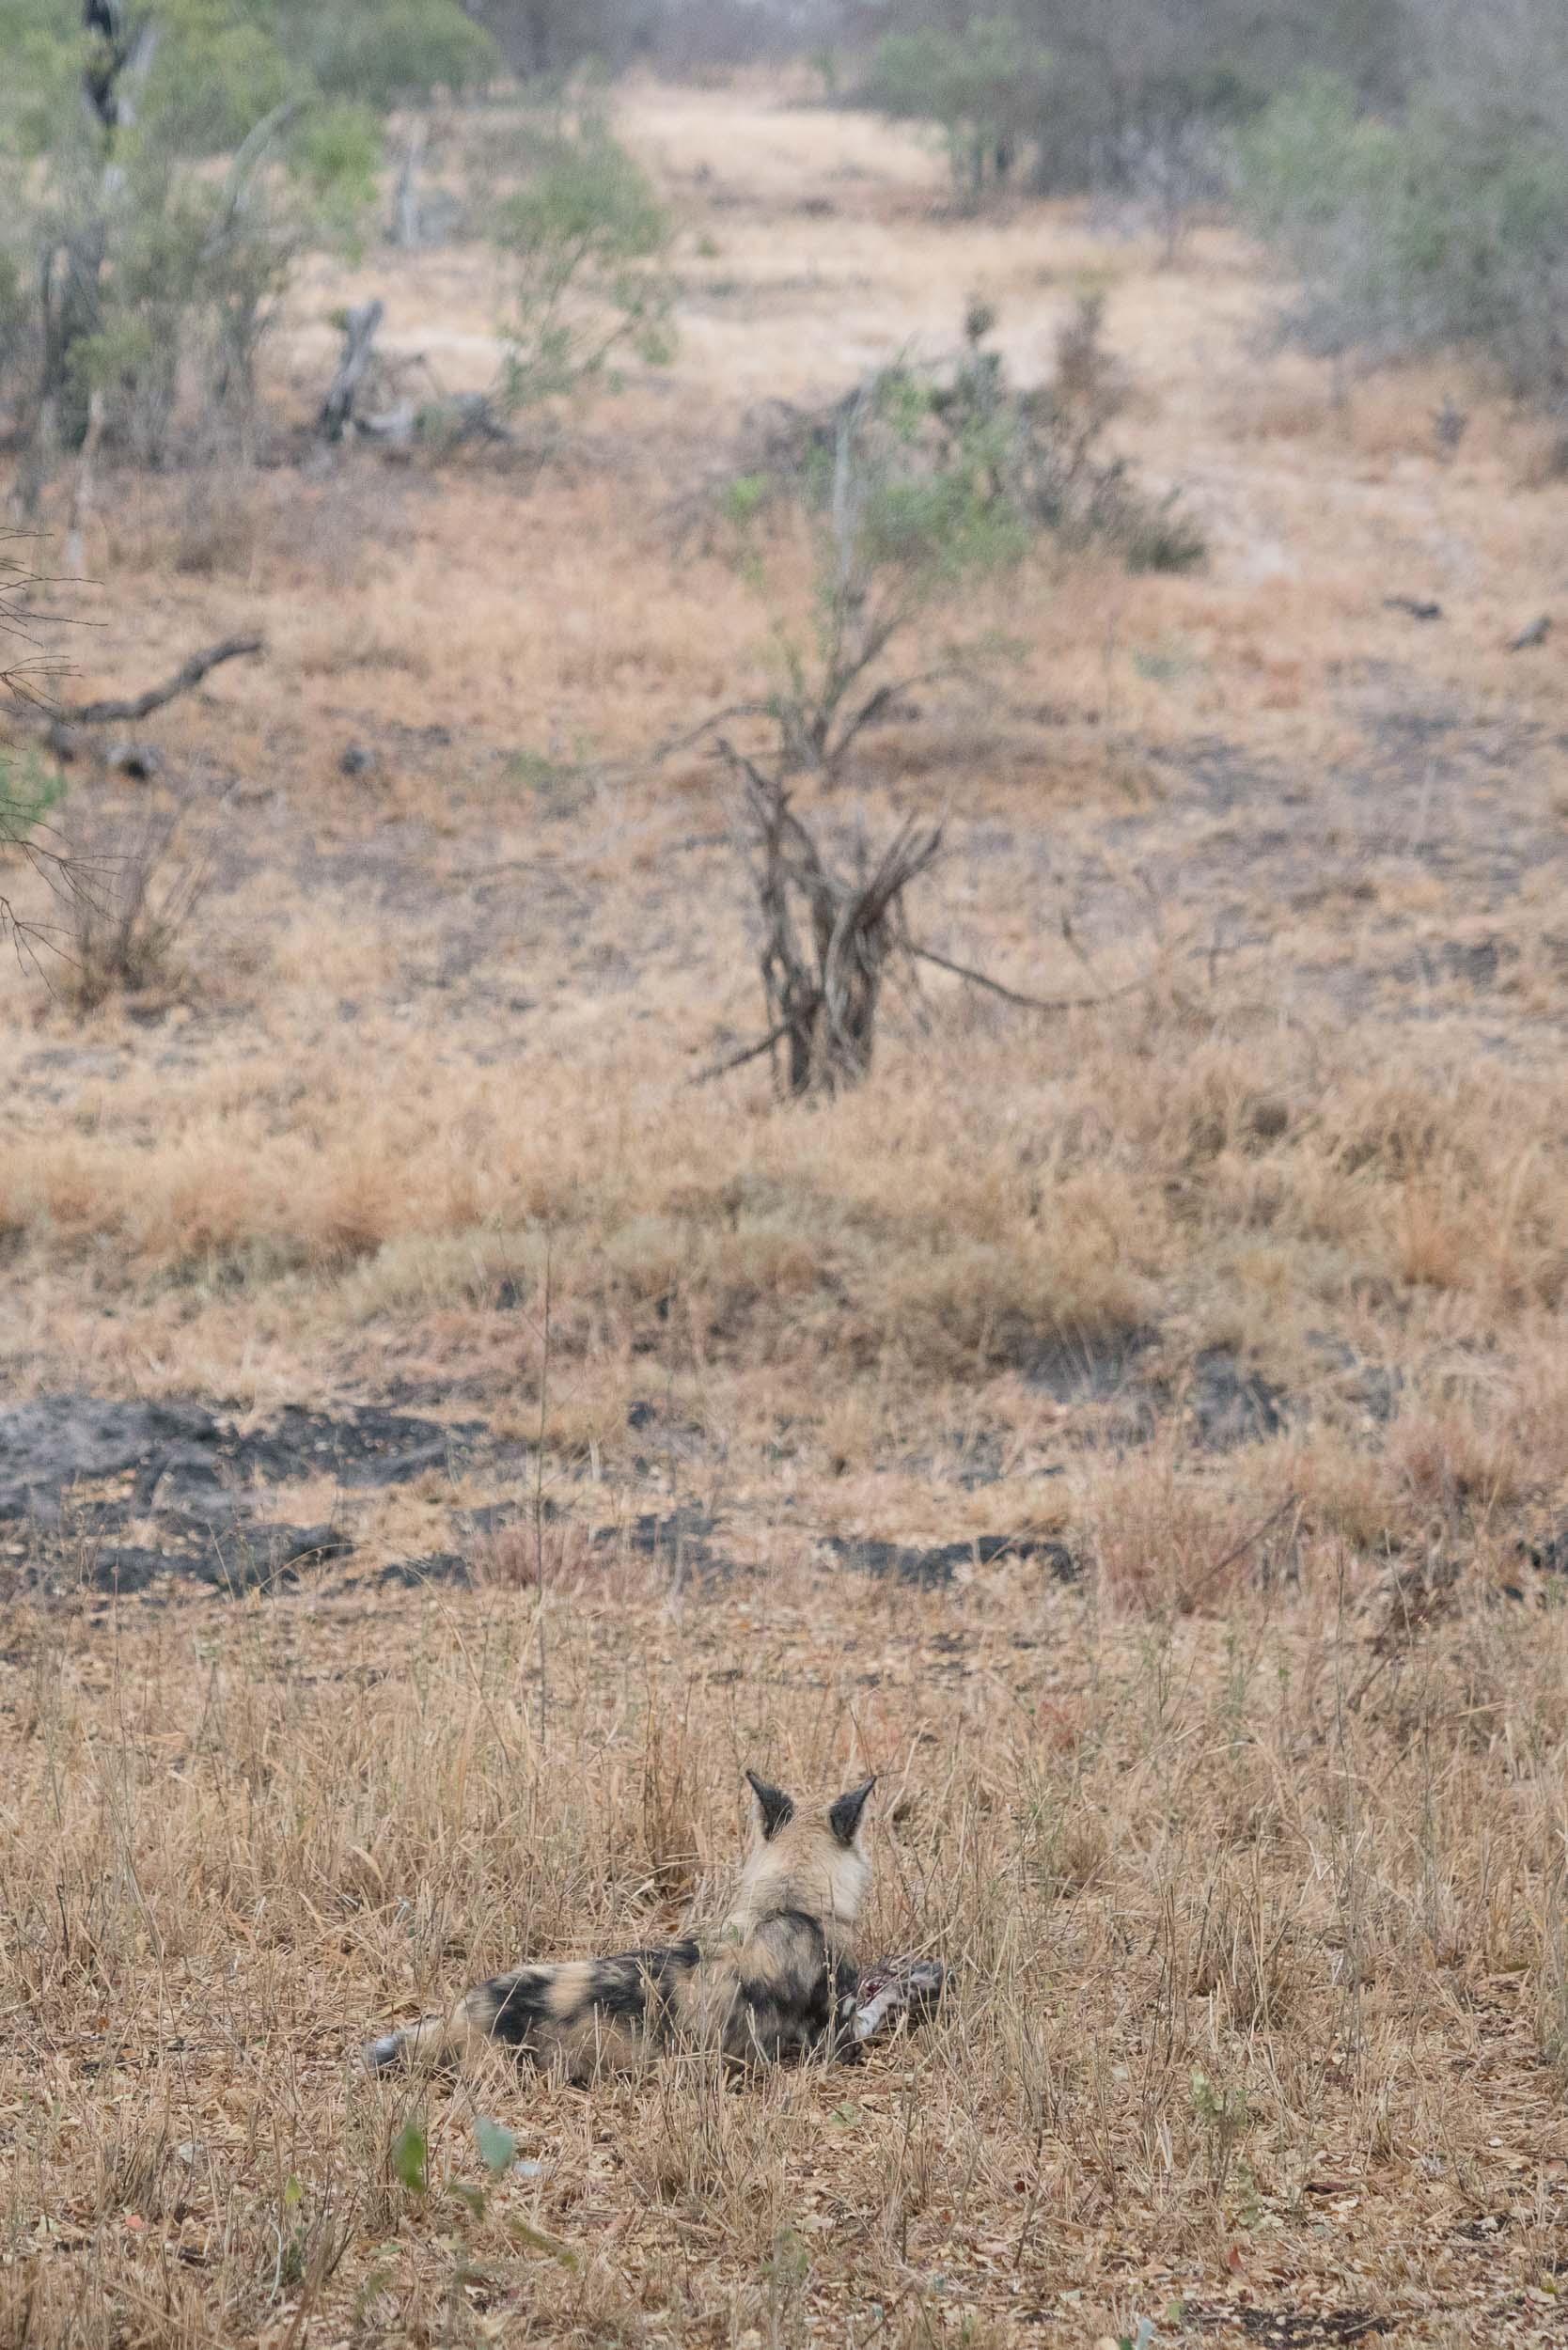 the_getaway_edit_south_africa_safari_lion_sands_game_reserve-41.jpg